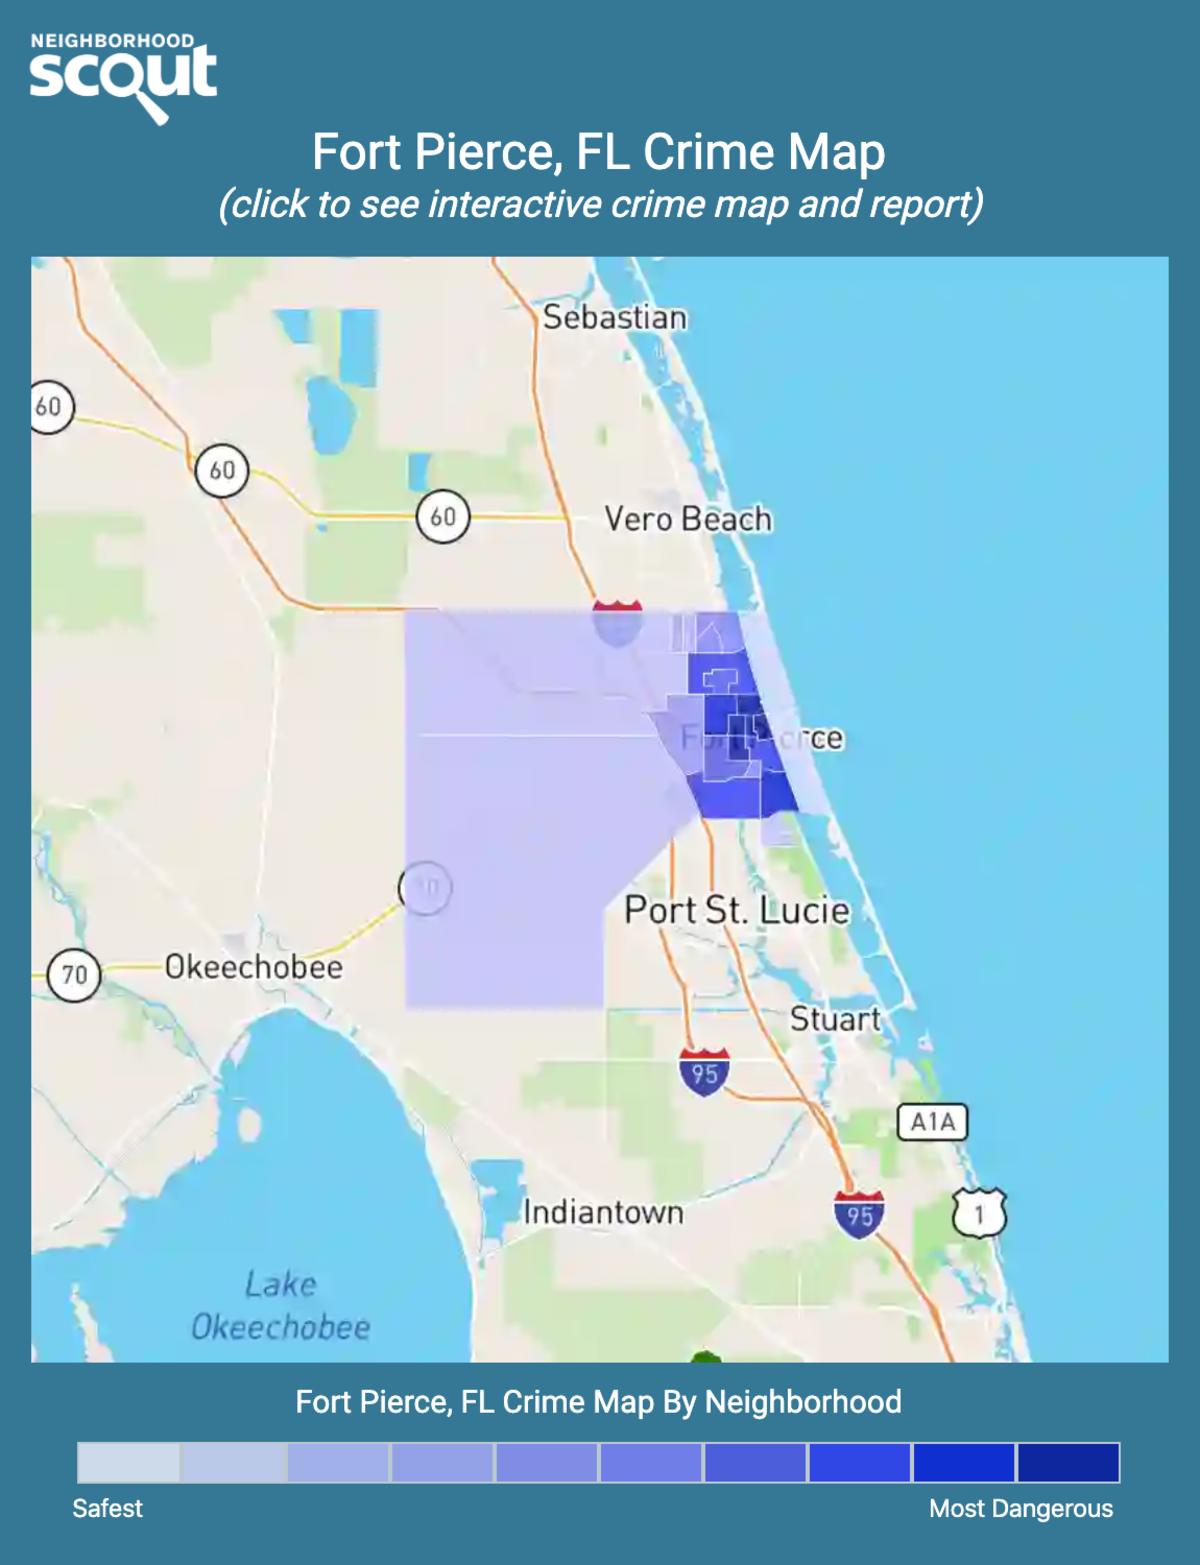 Fort Pierce, Florida crime map